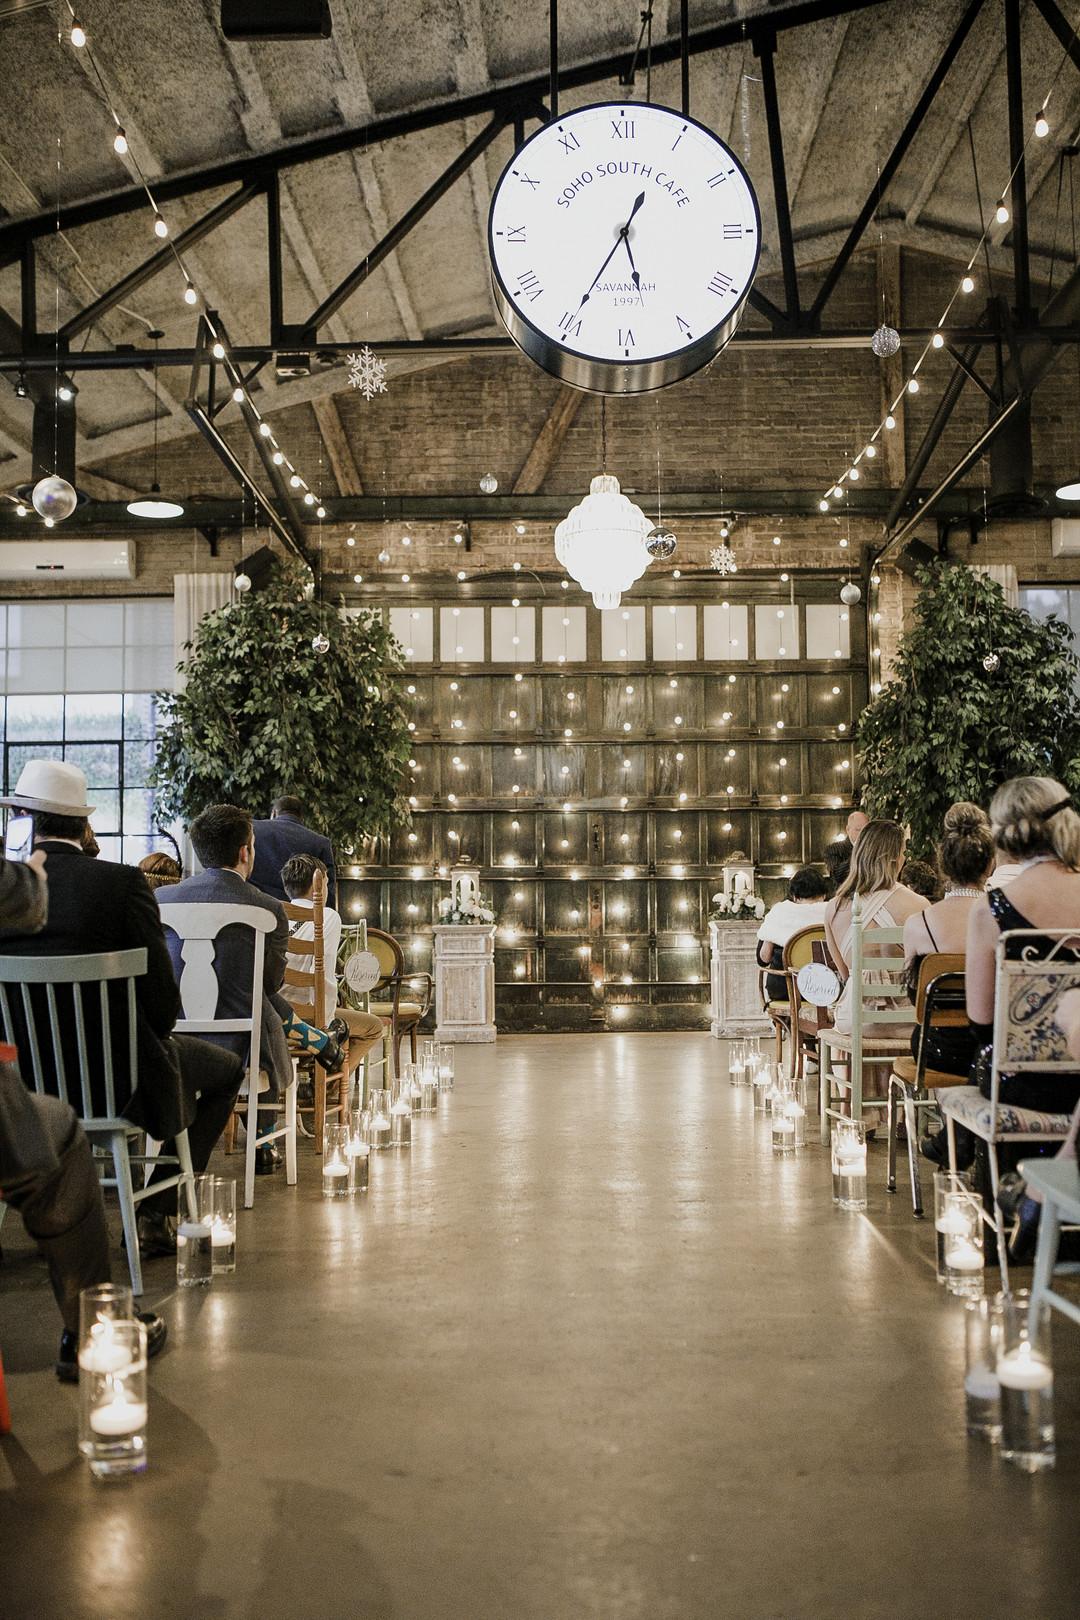 soho-south-cafe-wedding-21.jpg